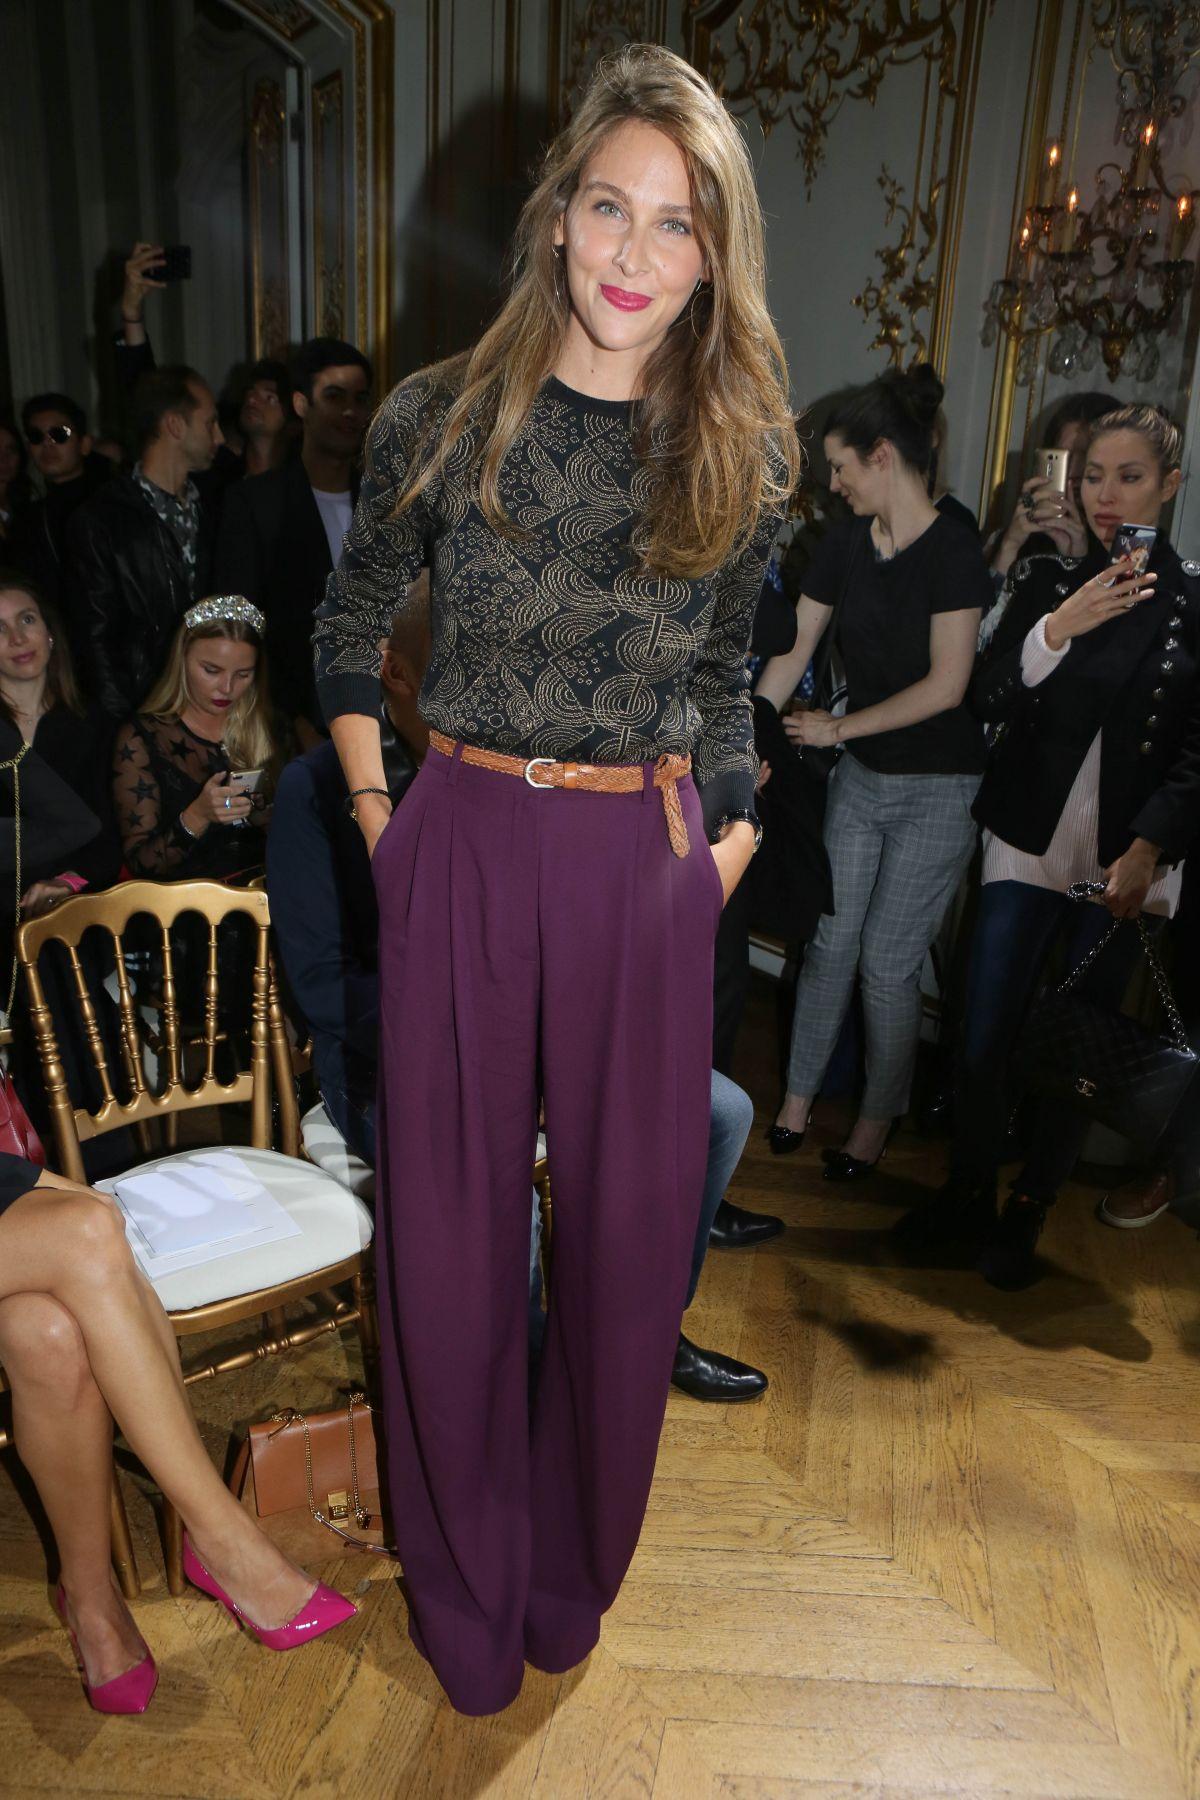 Ophelie meunier john galliano fashion show in paris - 2019 year